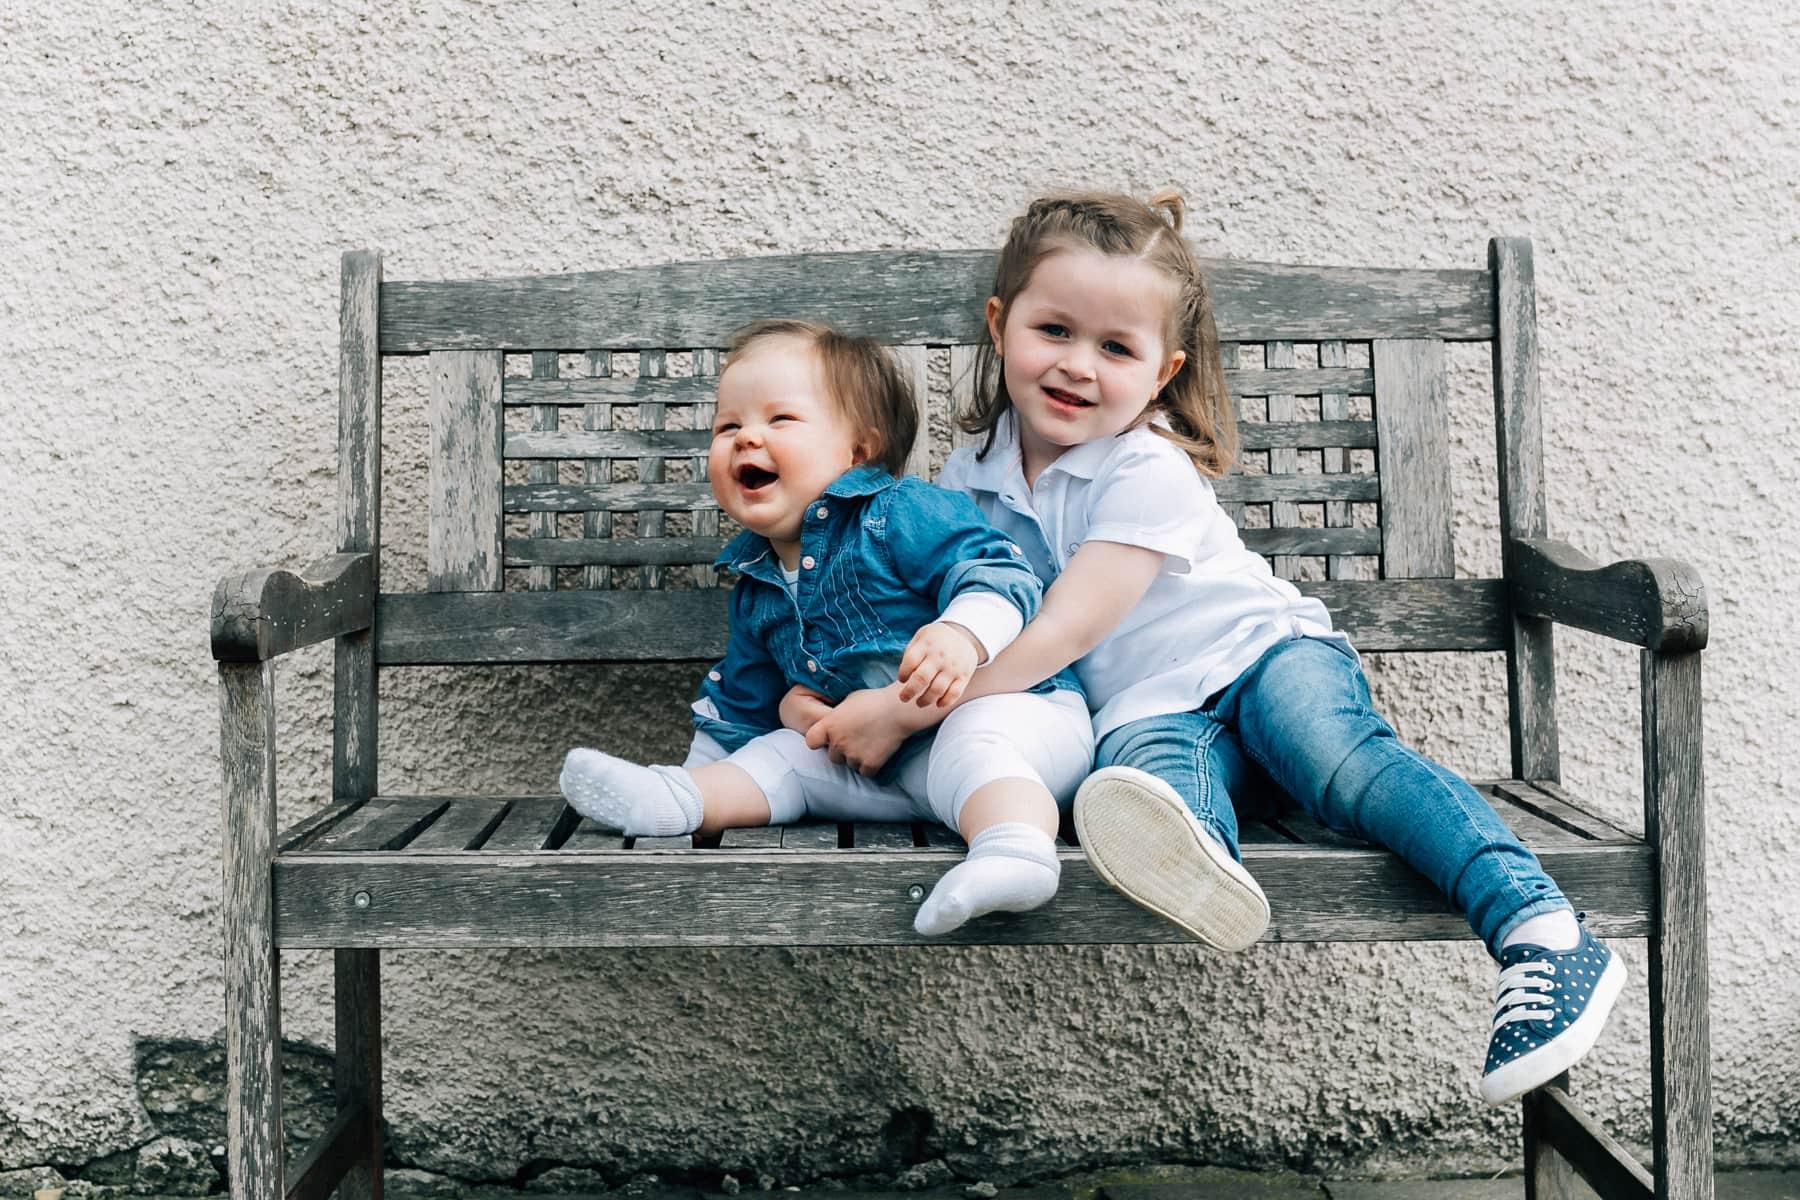 Familienshooting | Outdoor | Vöcklabruck